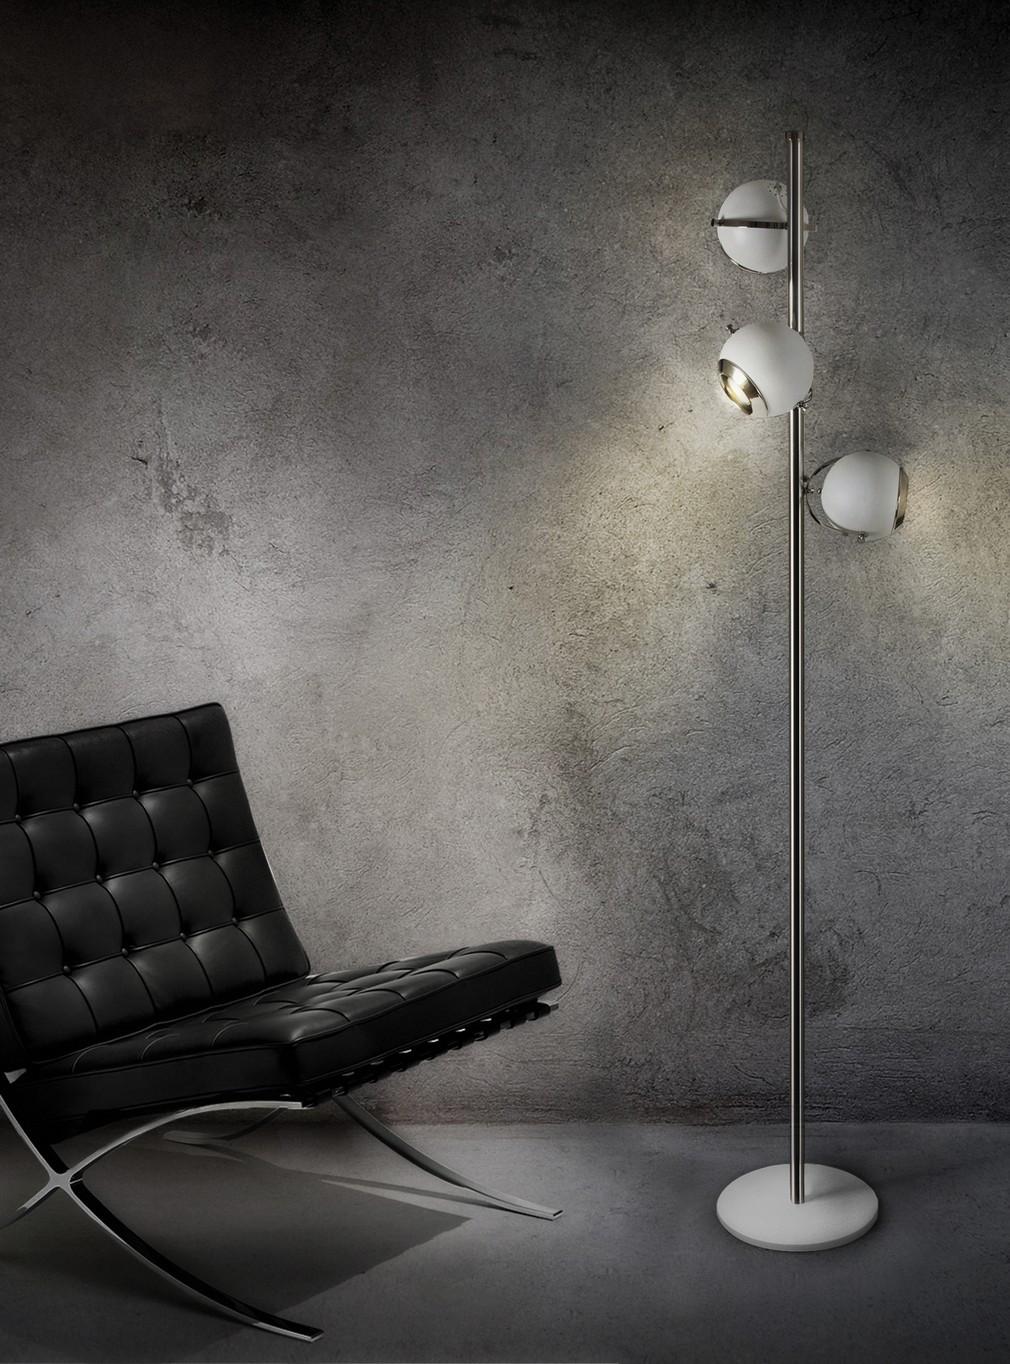 pop art style pop art style Pop Art Style Inspirations Scofield Floor Lamp! delightfull scofield 01